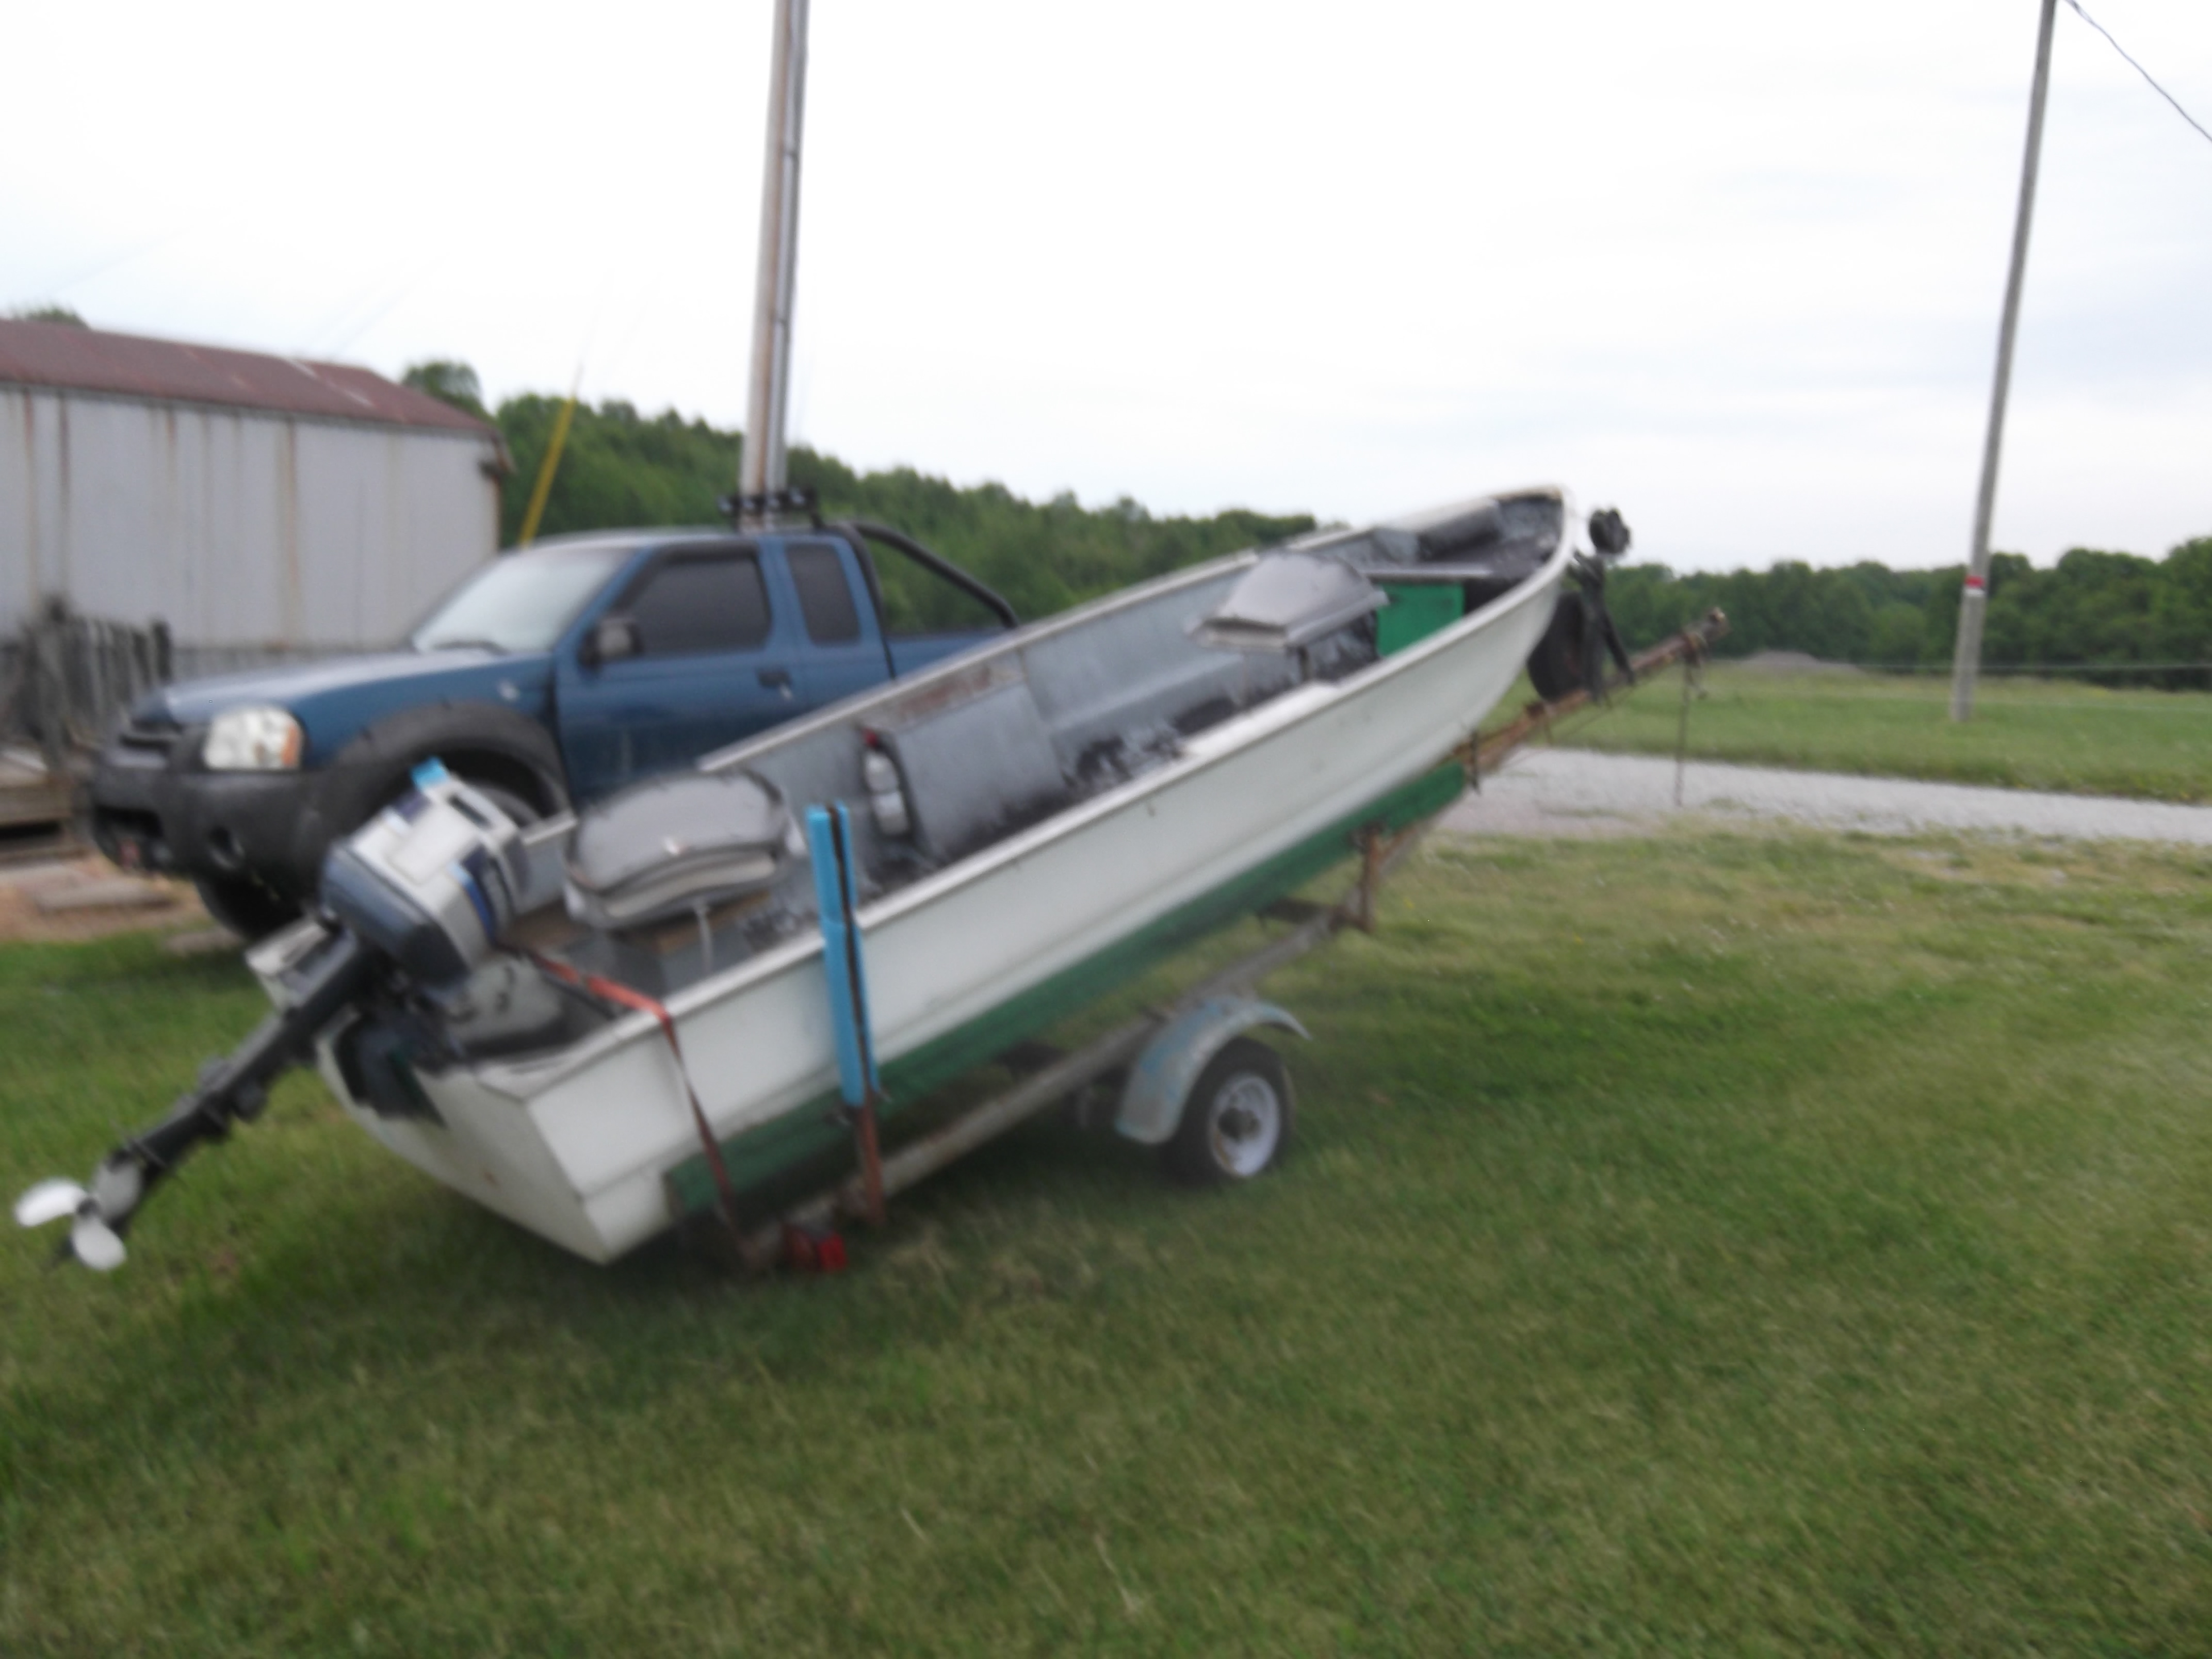 14 ft fishing boat nashville 37083 lafayette boat for 14 ft fishing boat